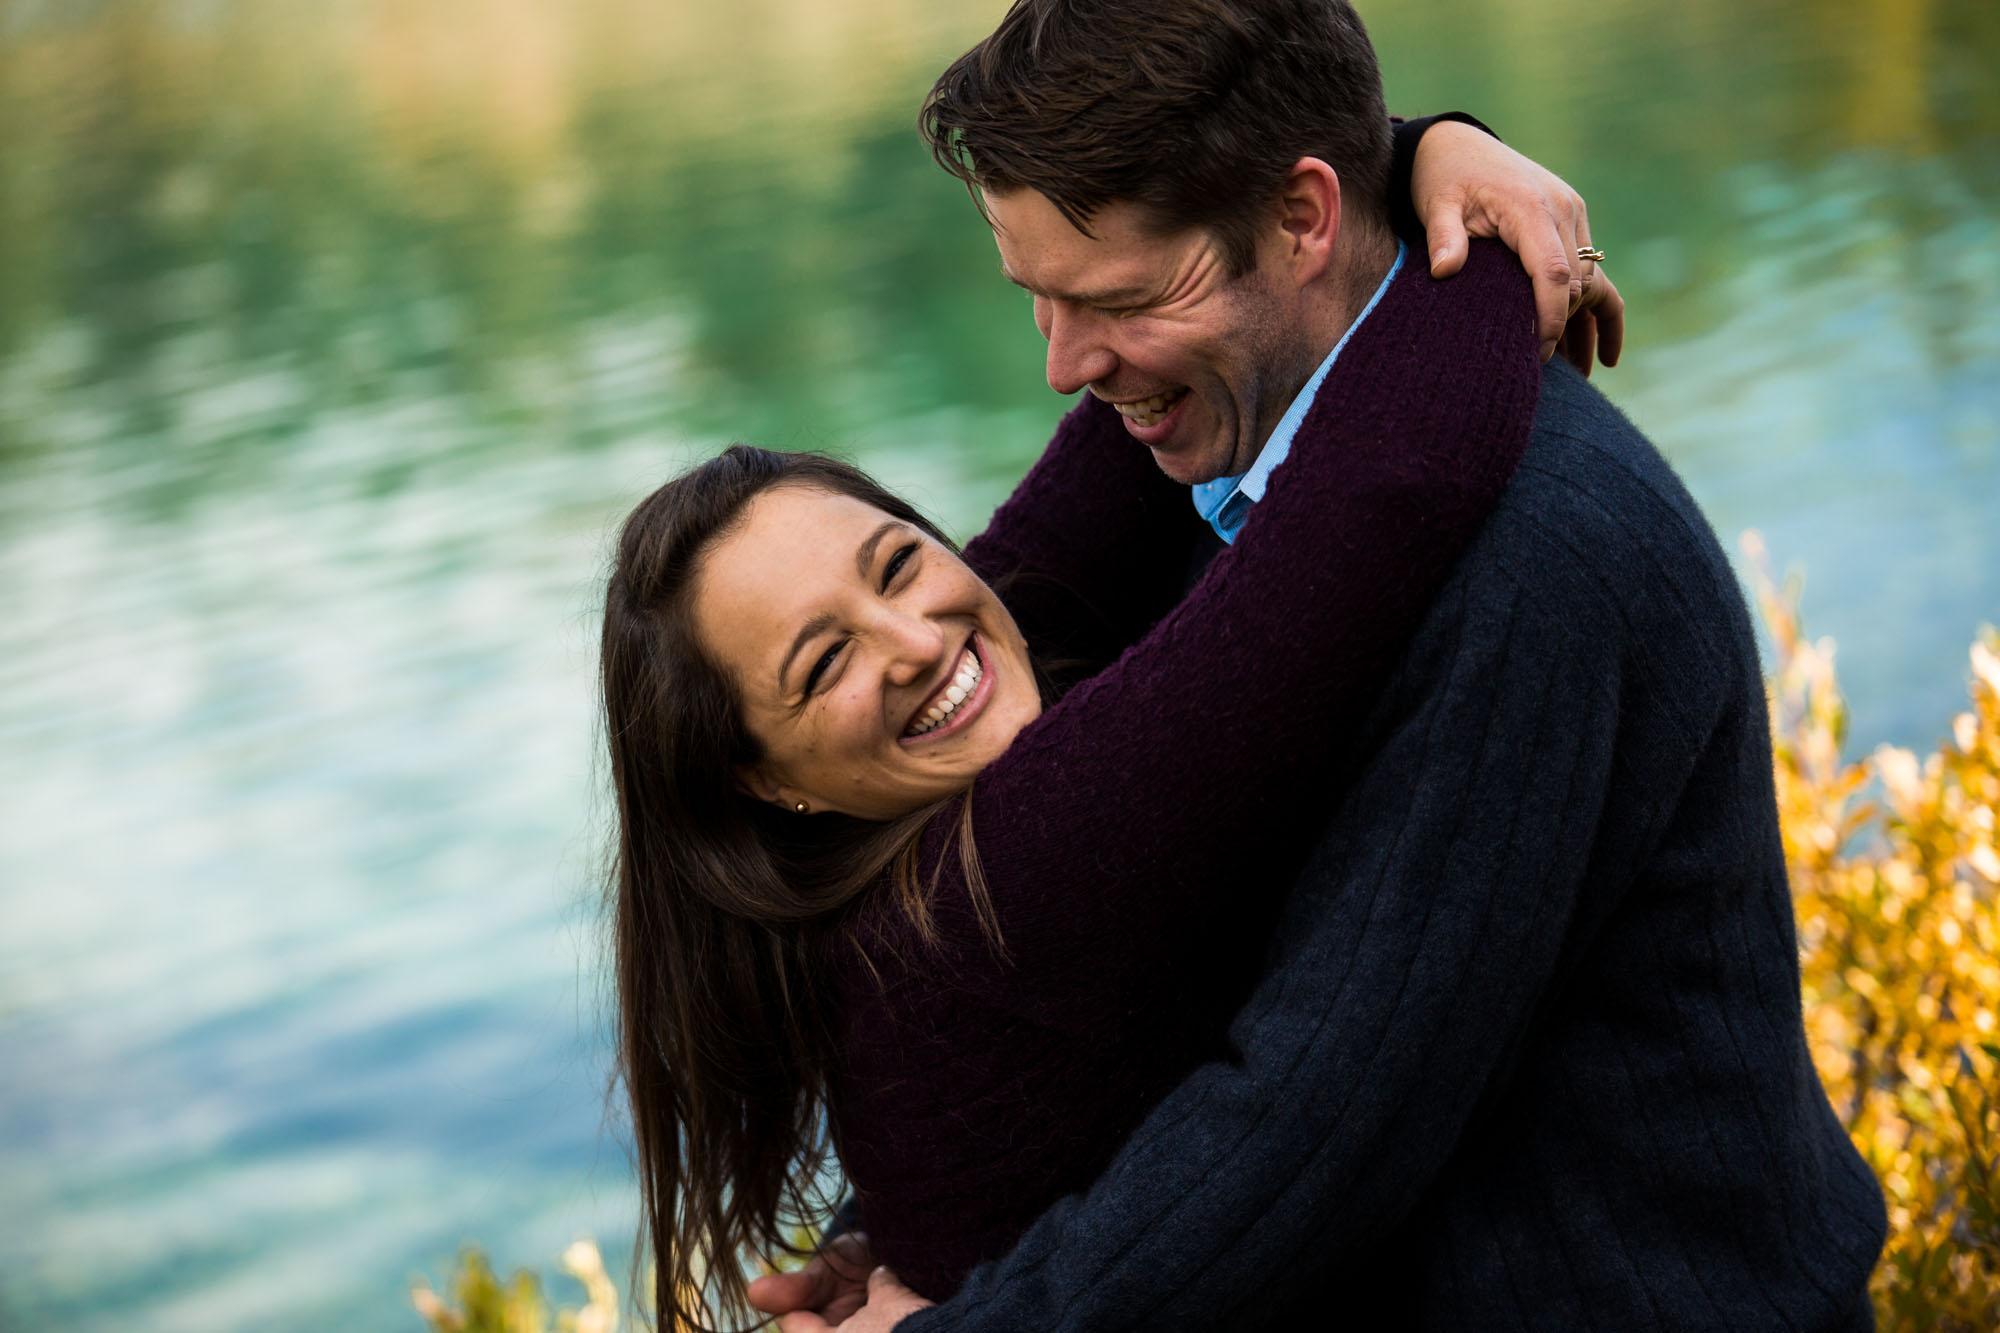 Calgary wedding photographer - calgary engagement photography